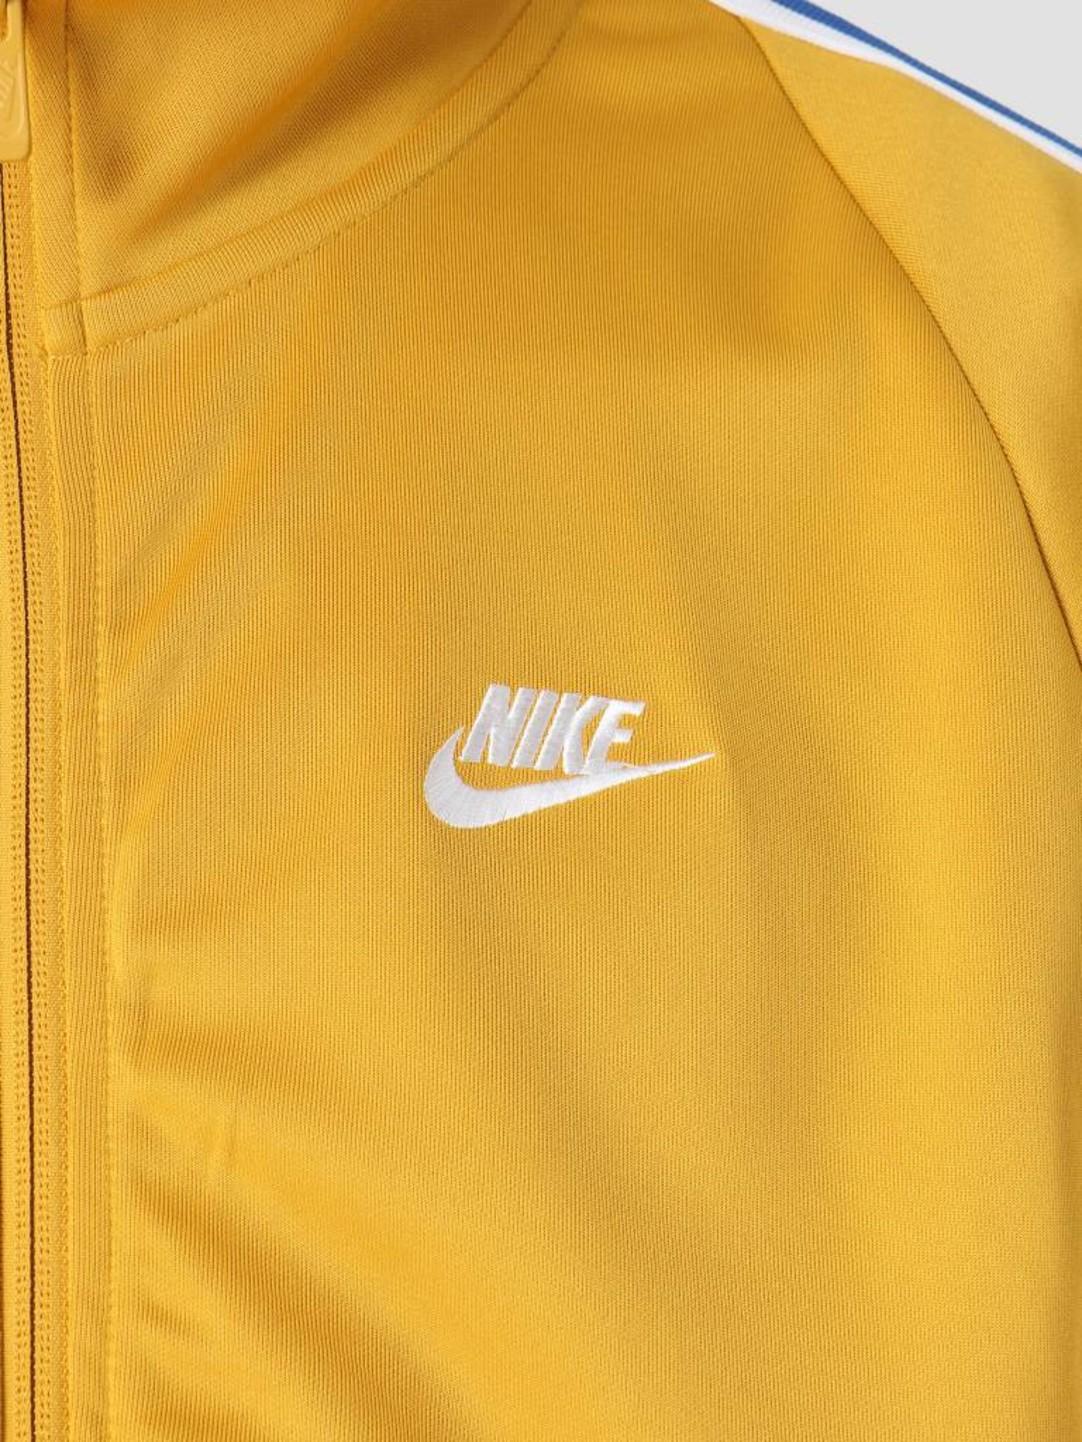 Nike Nike Sportswear N98 Sweat Gold Dart Sail Ar2244-711